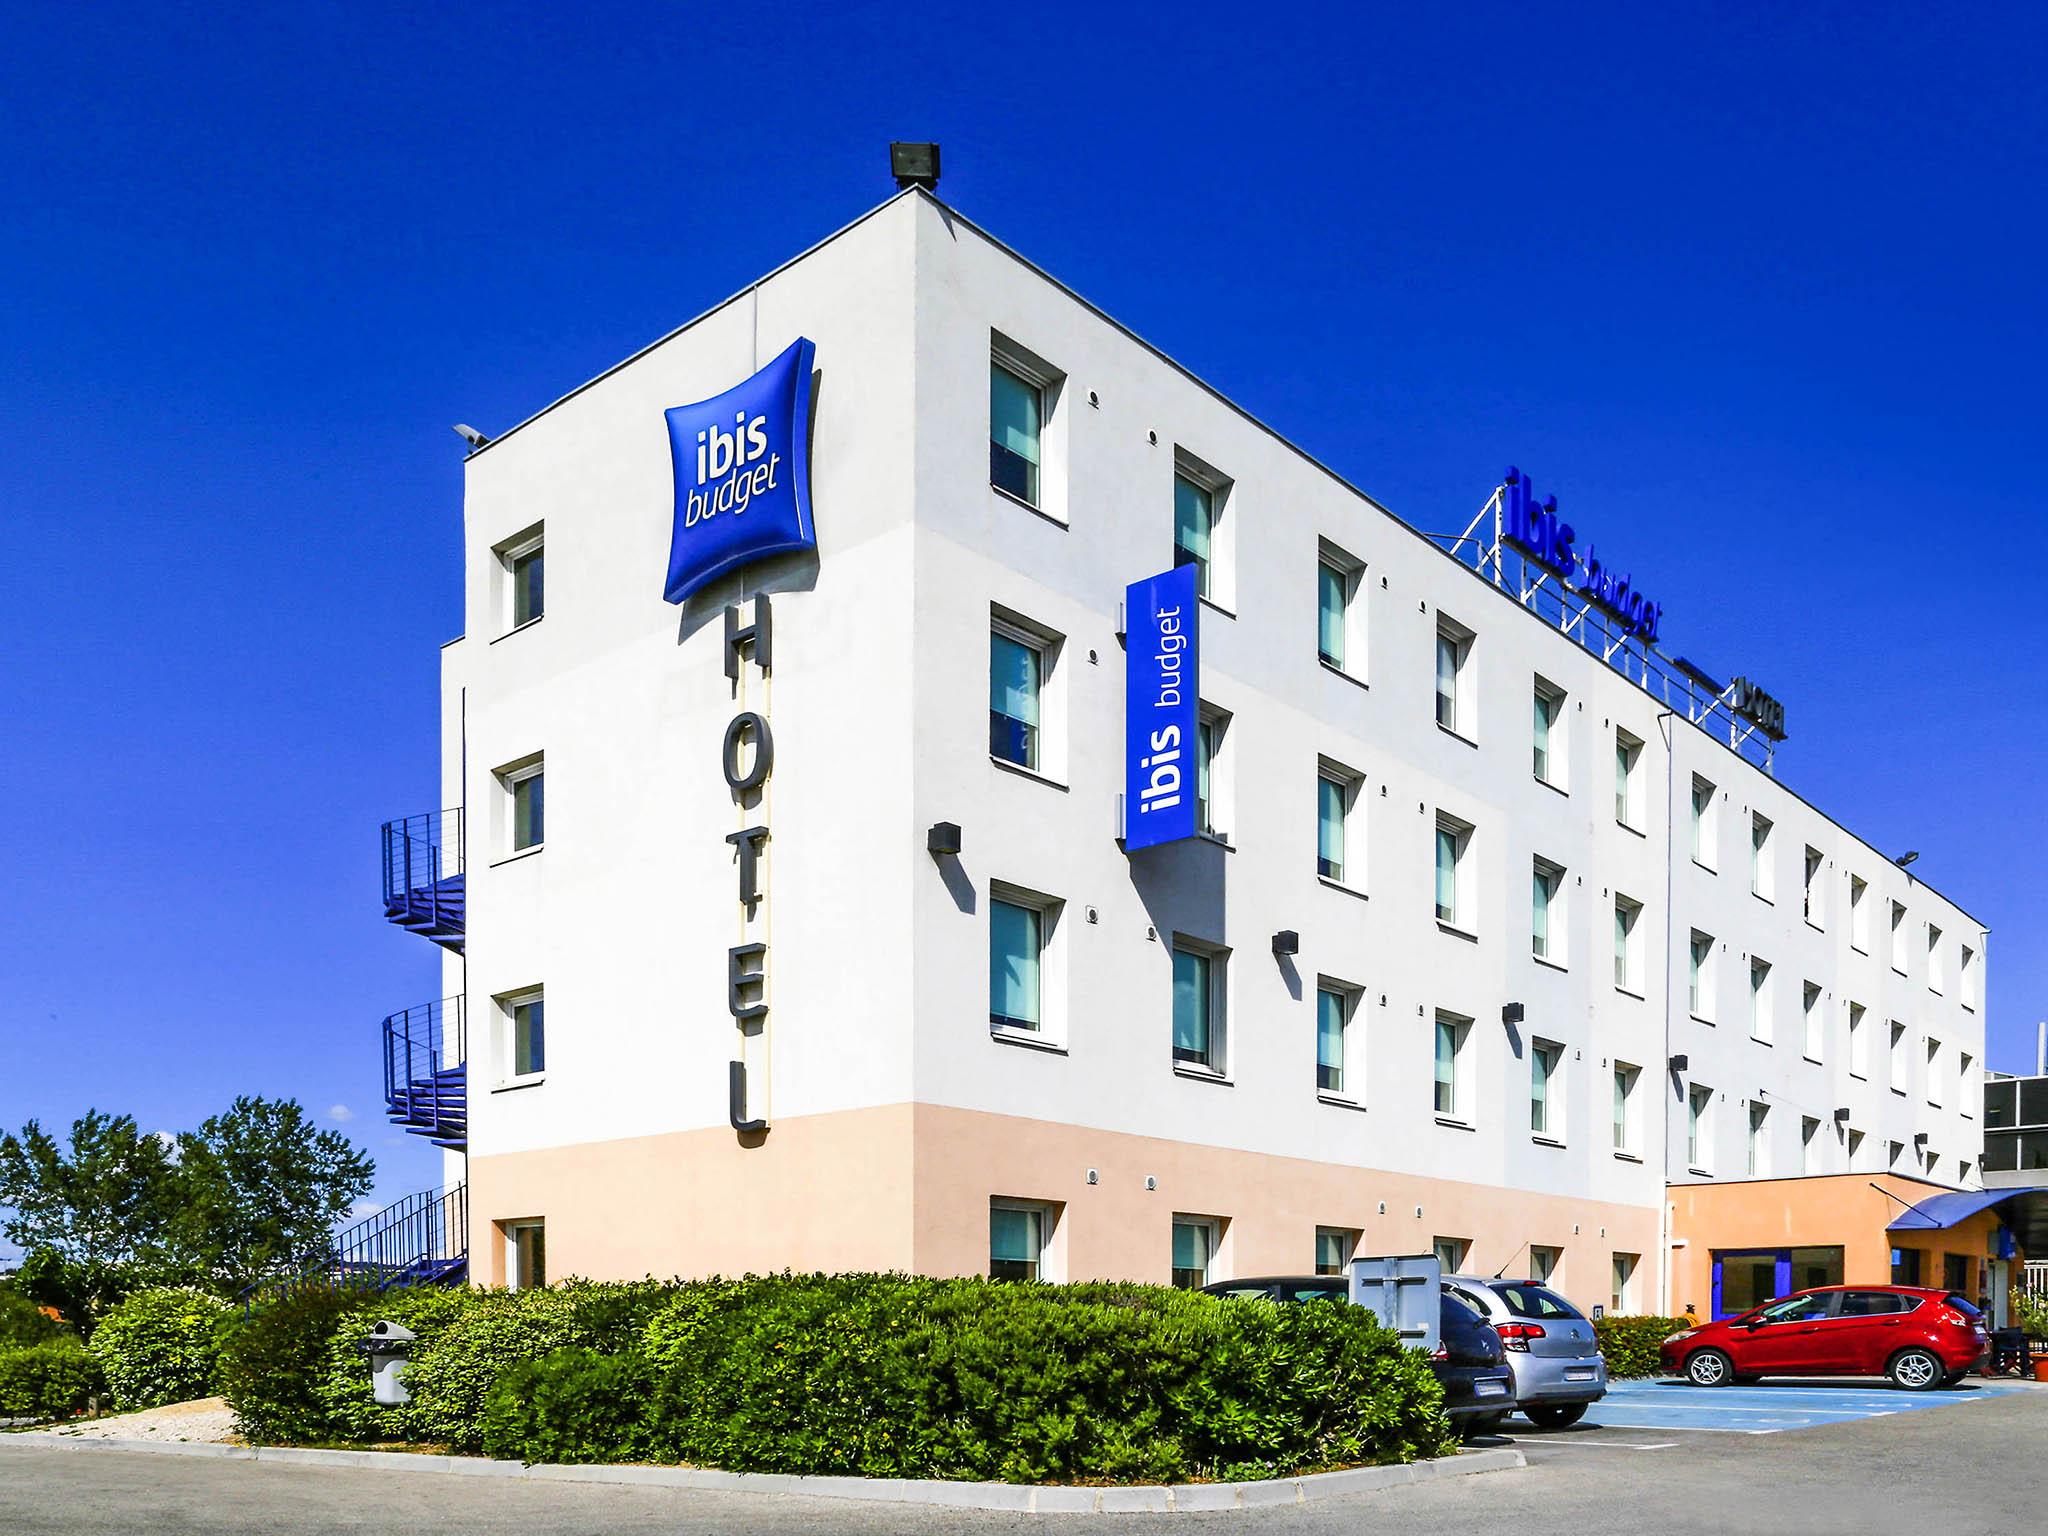 Hotel – ibis budget Marsella Vitrolles